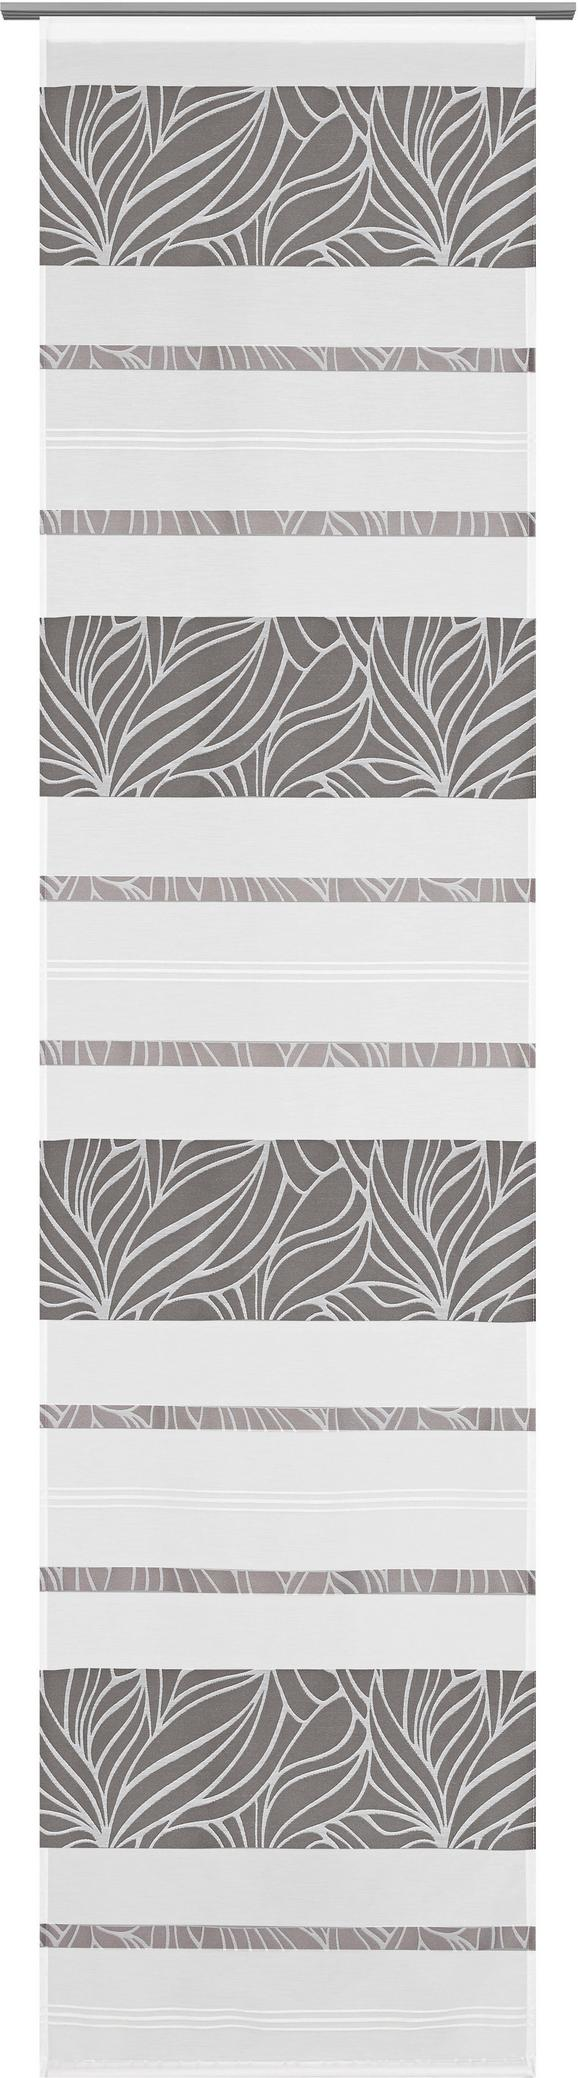 Panelna Zavesa Anita - siva, Konvencionalno, tekstil (60/245cm) - Modern Living